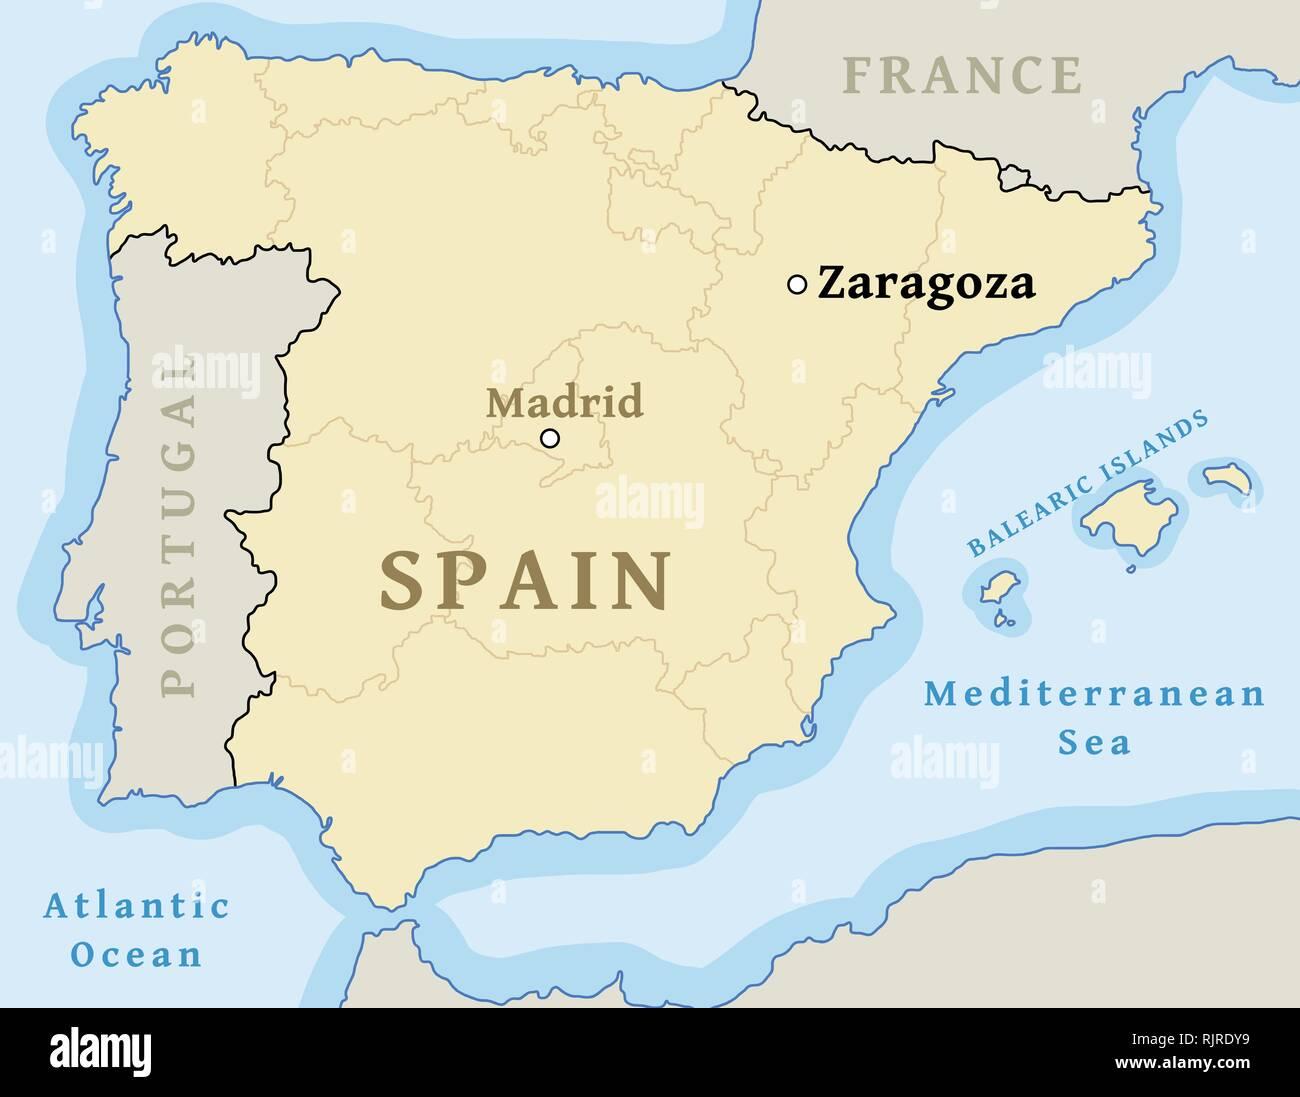 Saragozza Spagna Cartina Geografica.Zaragoza Vector Immagini E Fotos Stock Alamy